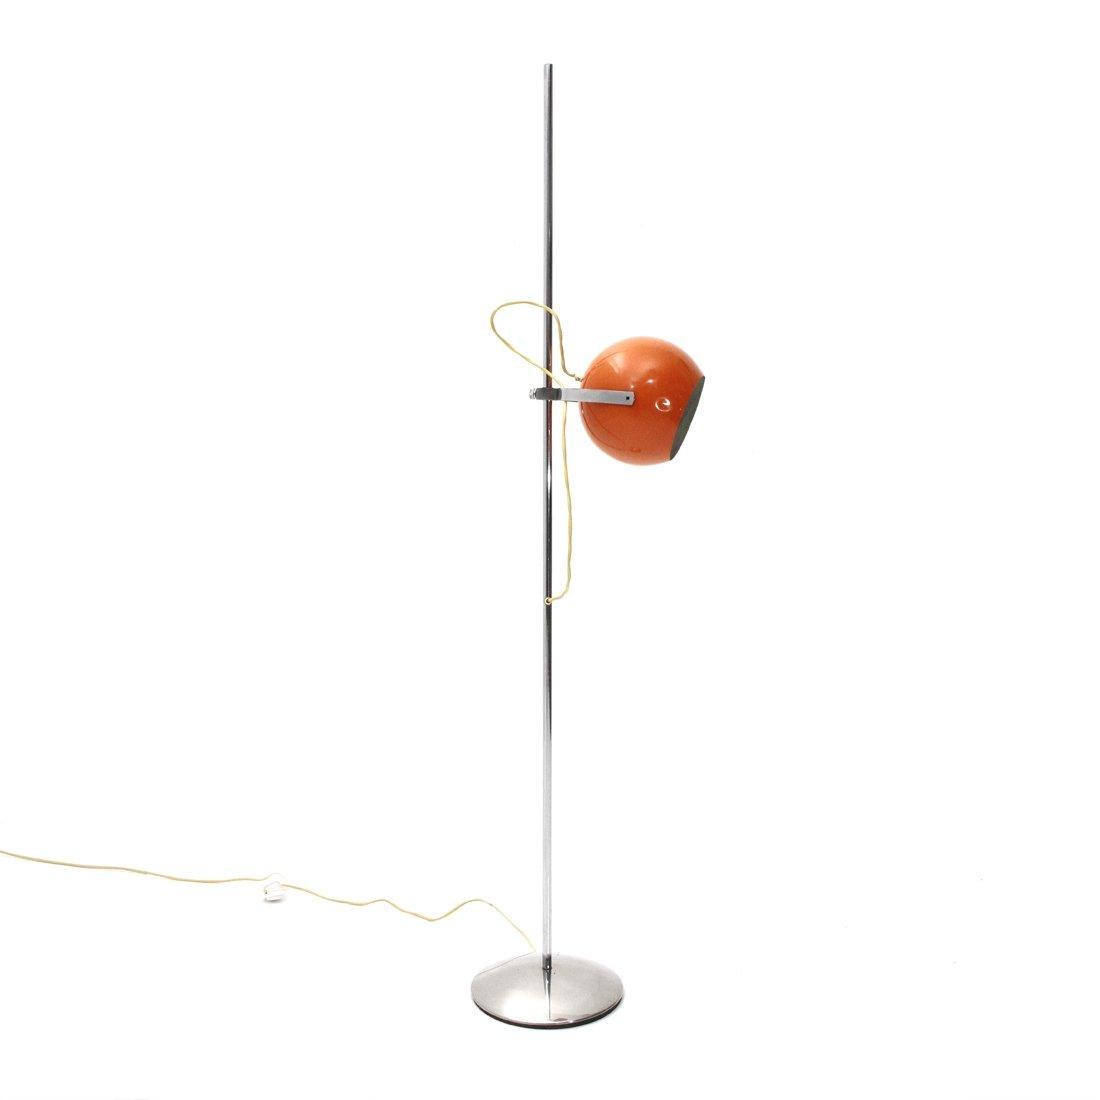 Mid Century Floor Lamp With Orange Shade By Reggiani 1970s